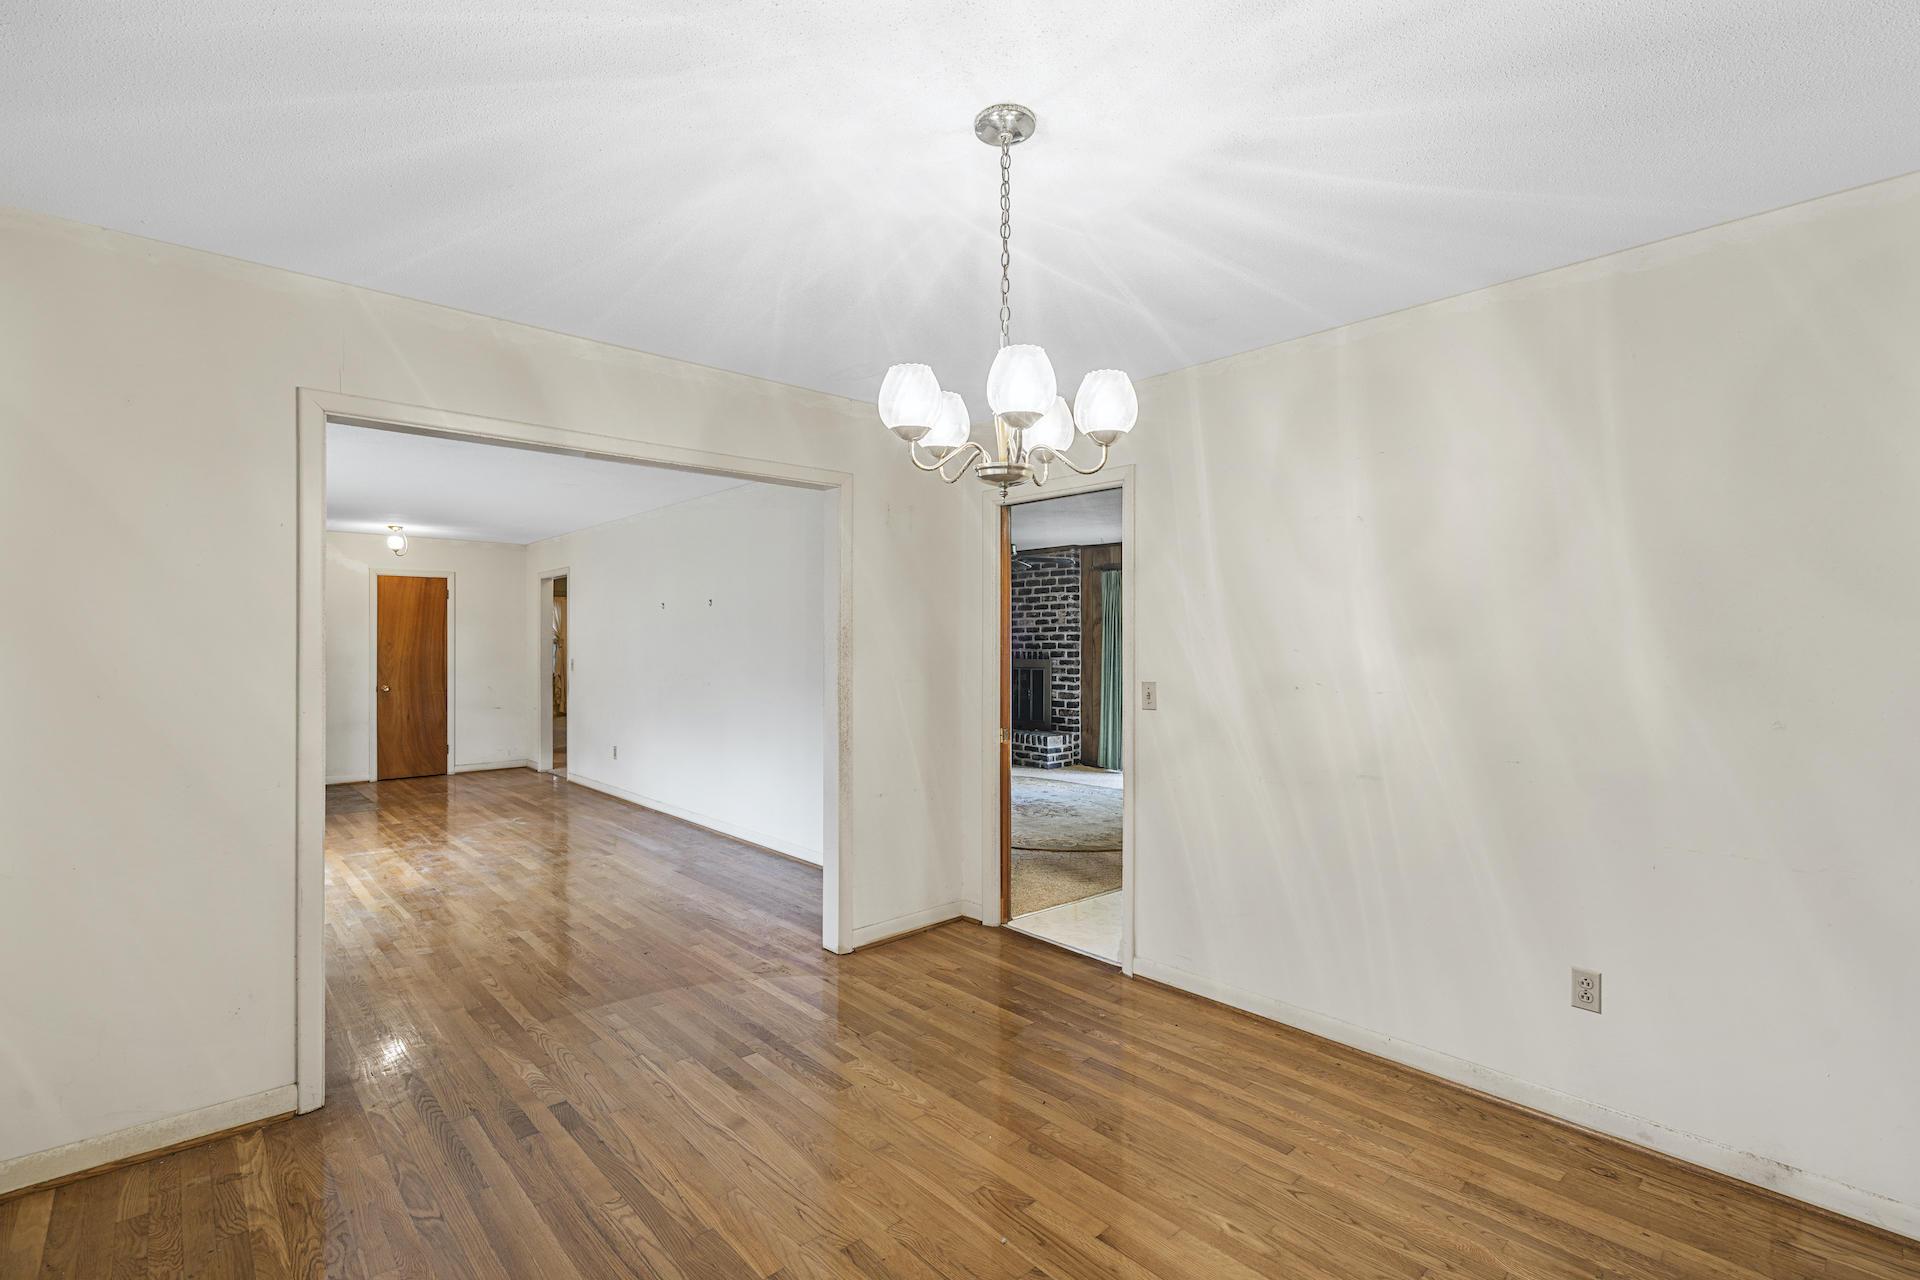 Charlestowne Estates I Homes For Sale - 1137 Culpepper, Charleston, SC - 3